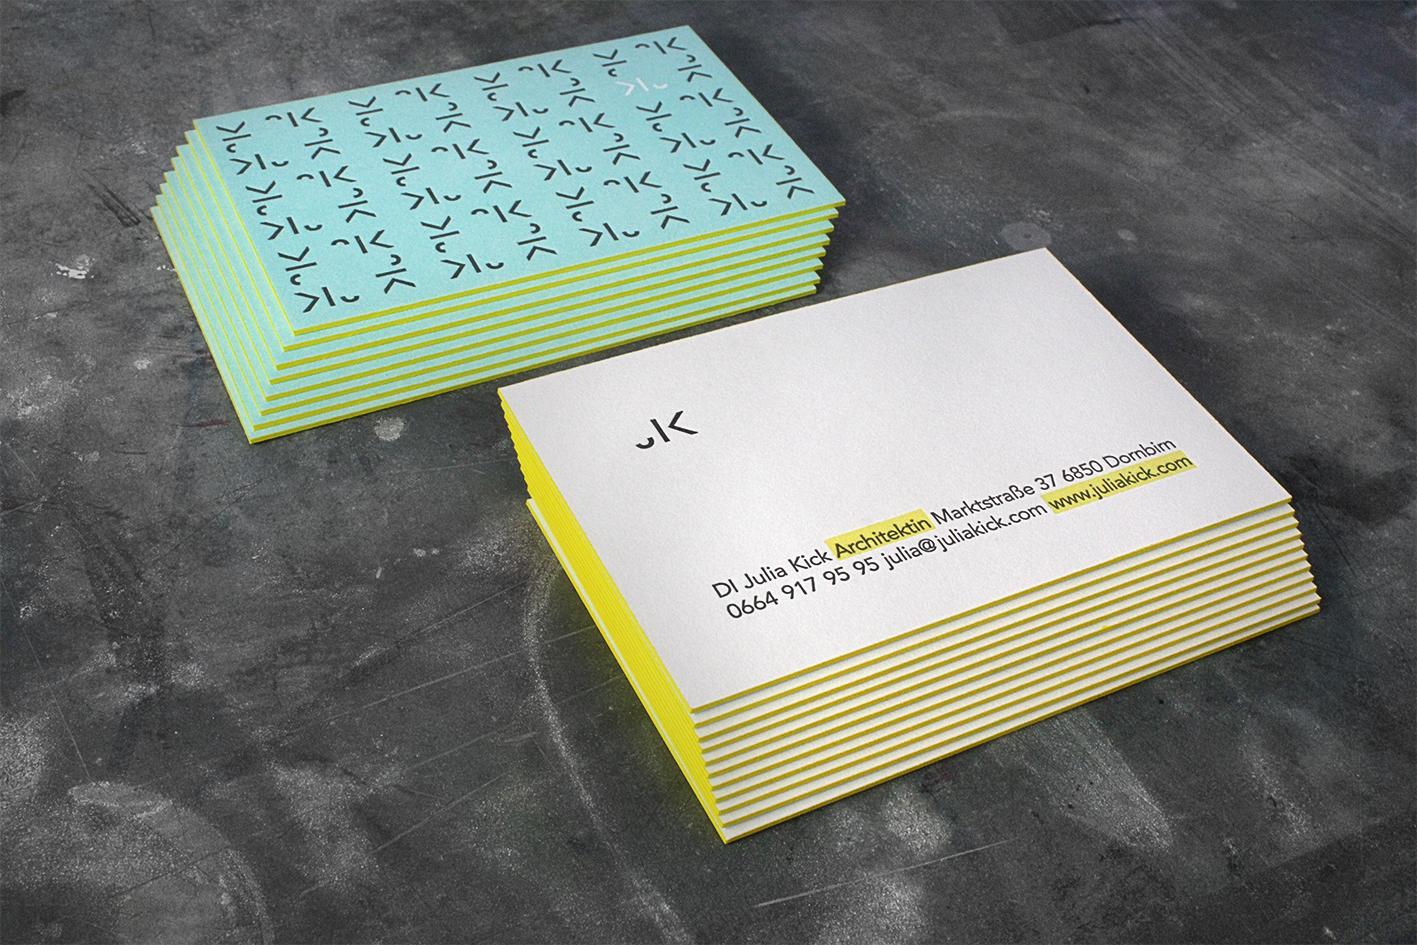 Schöndruck Letterpress Visitenkarten Farbschnitt Letterpress